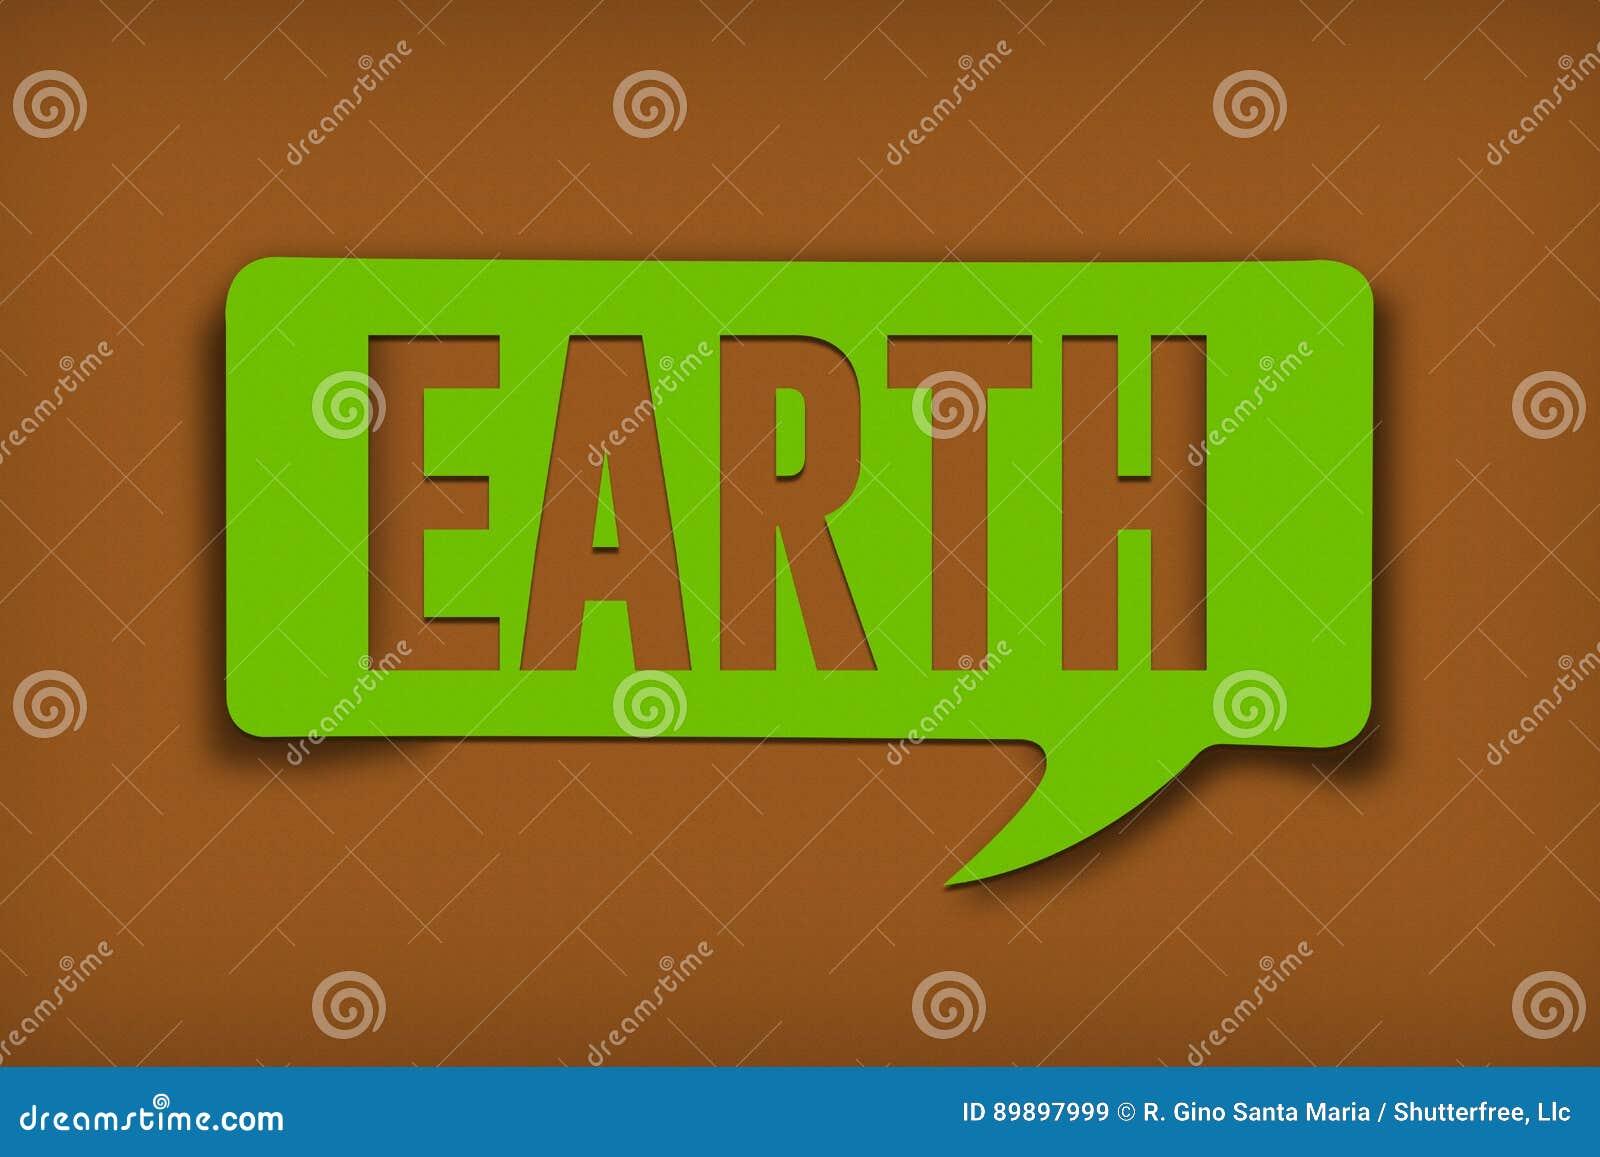 Earth Text Bubble